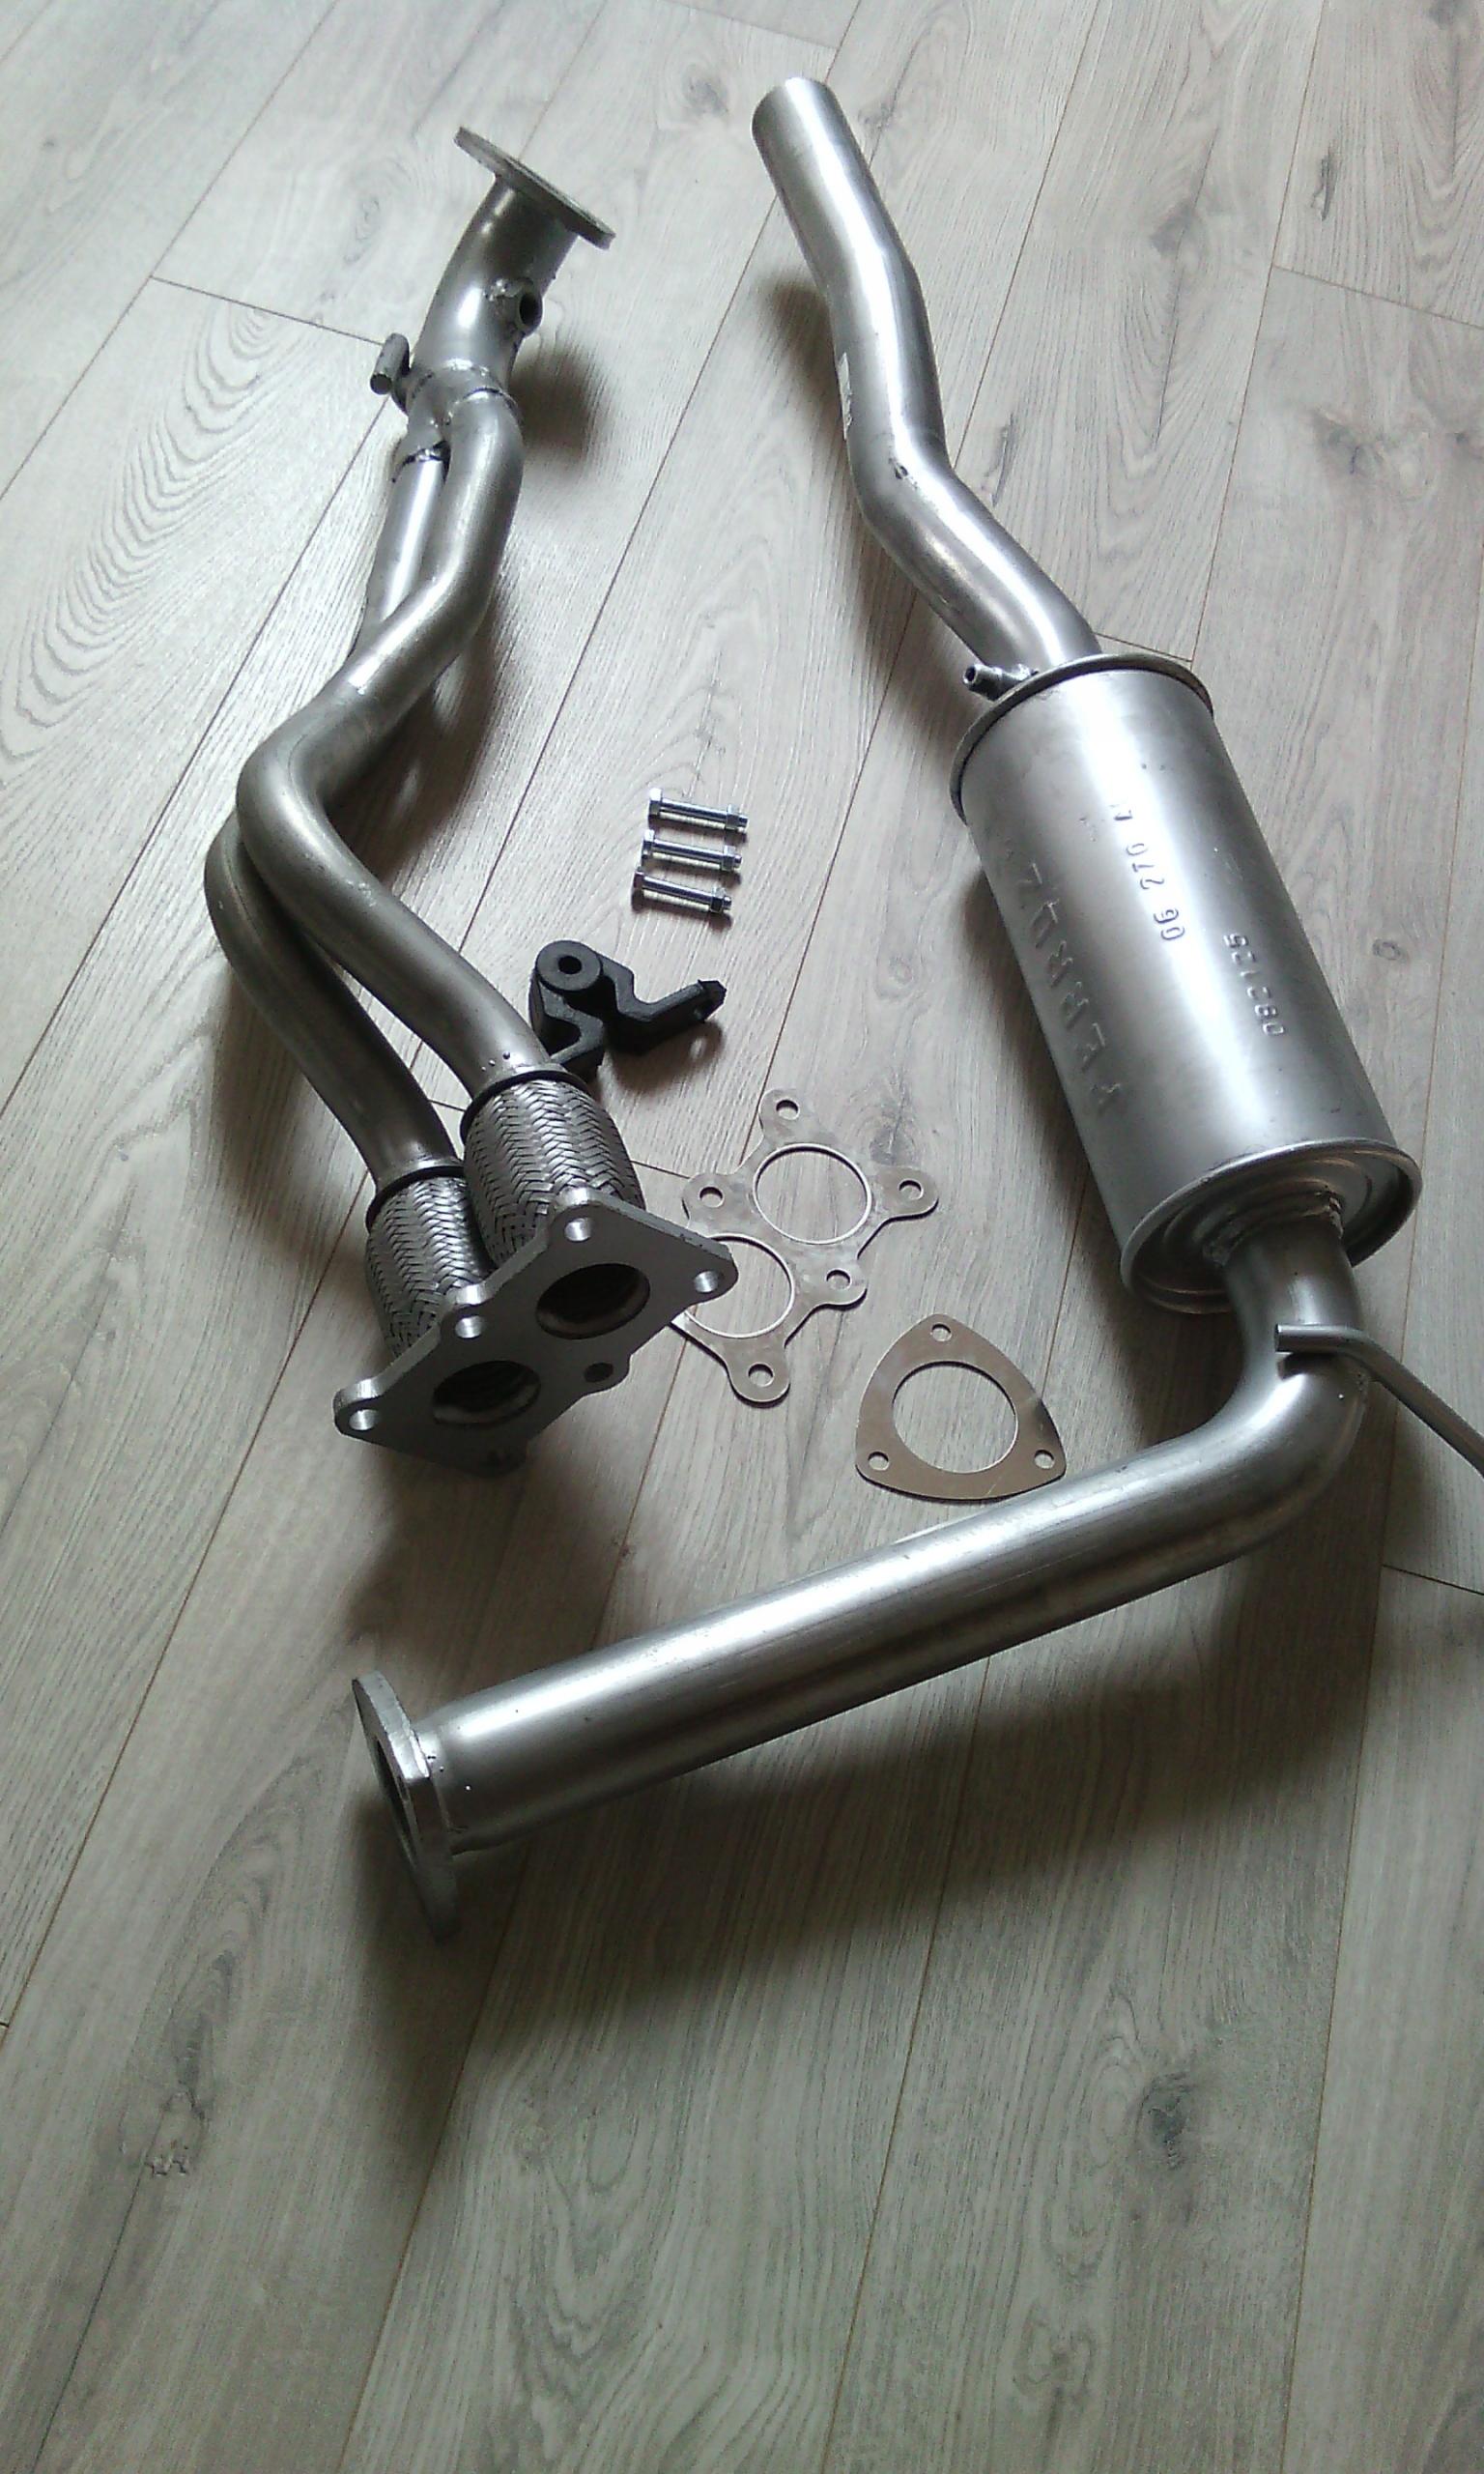 Vw transporter t4 2.0 2.5 глушитель poczatkowy + труба - фото 4